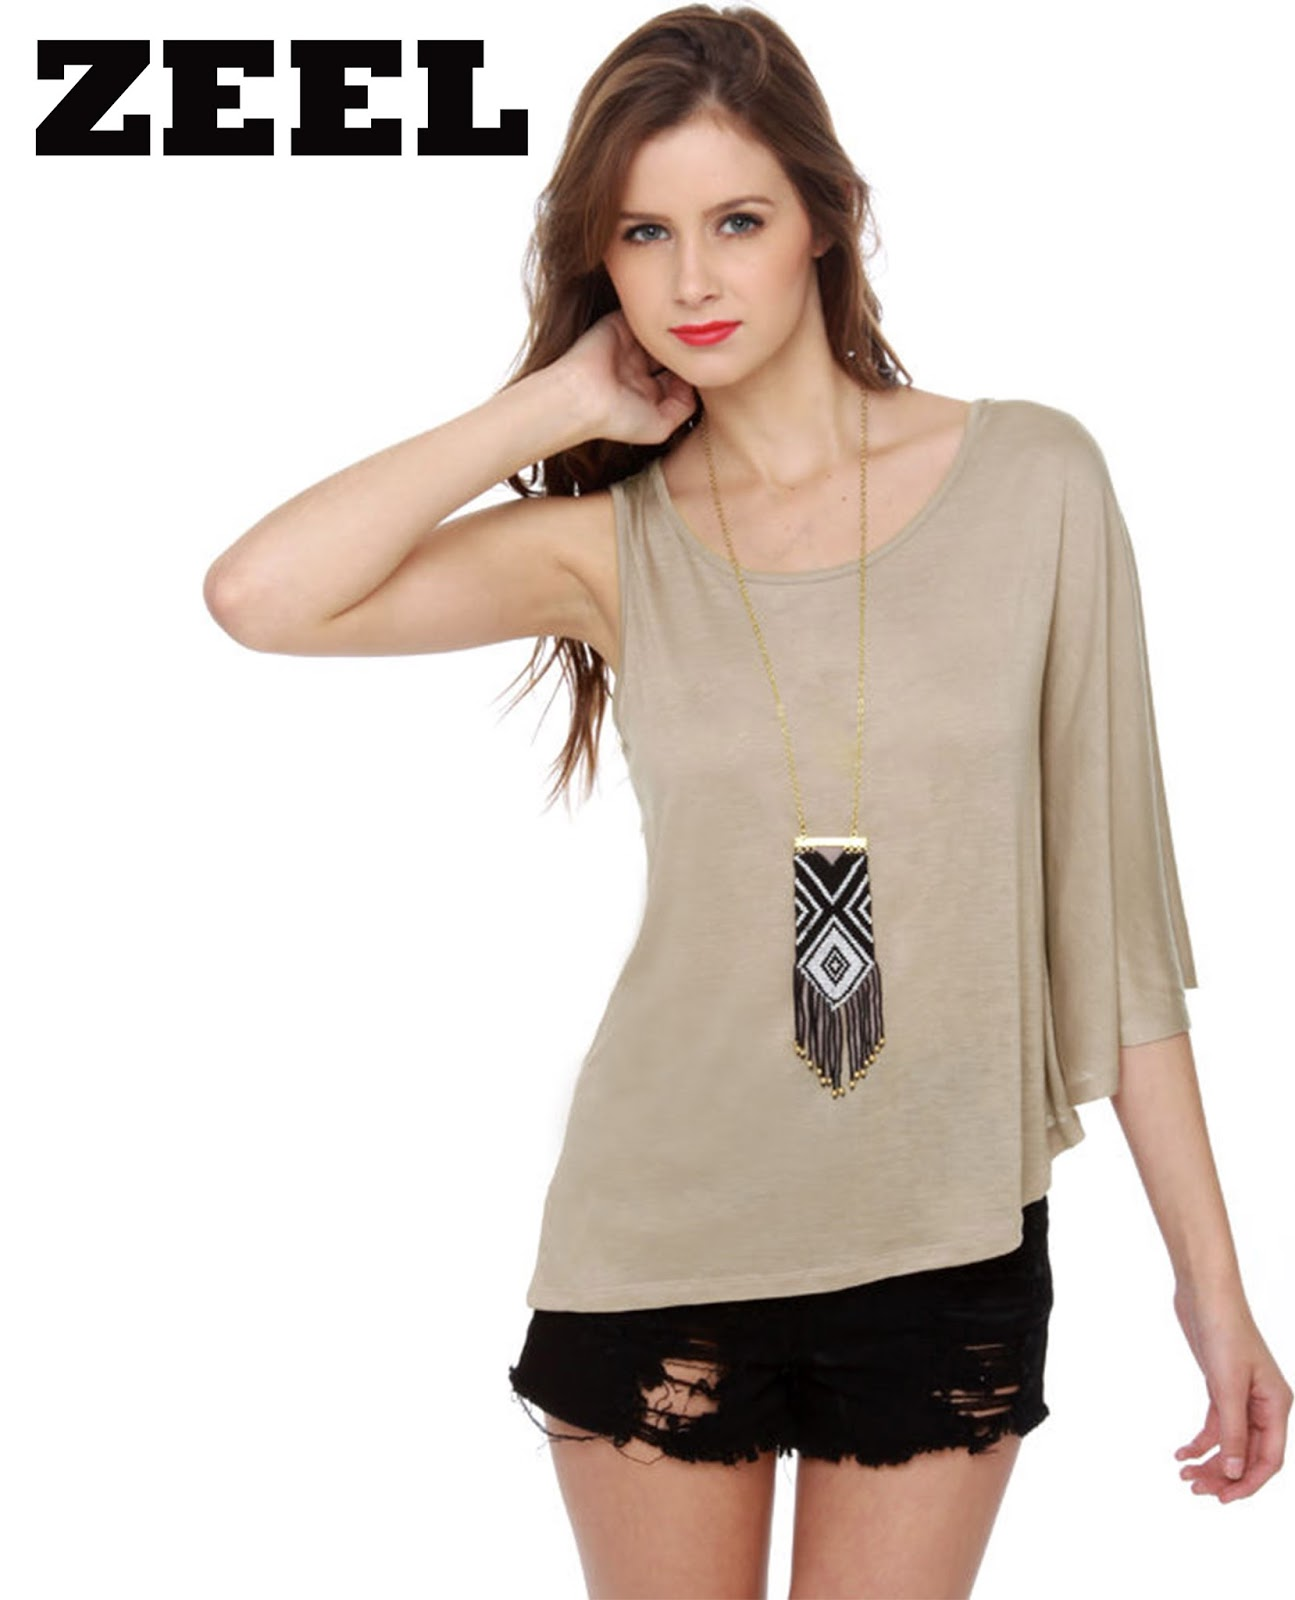 Hot fashion clothes women 22